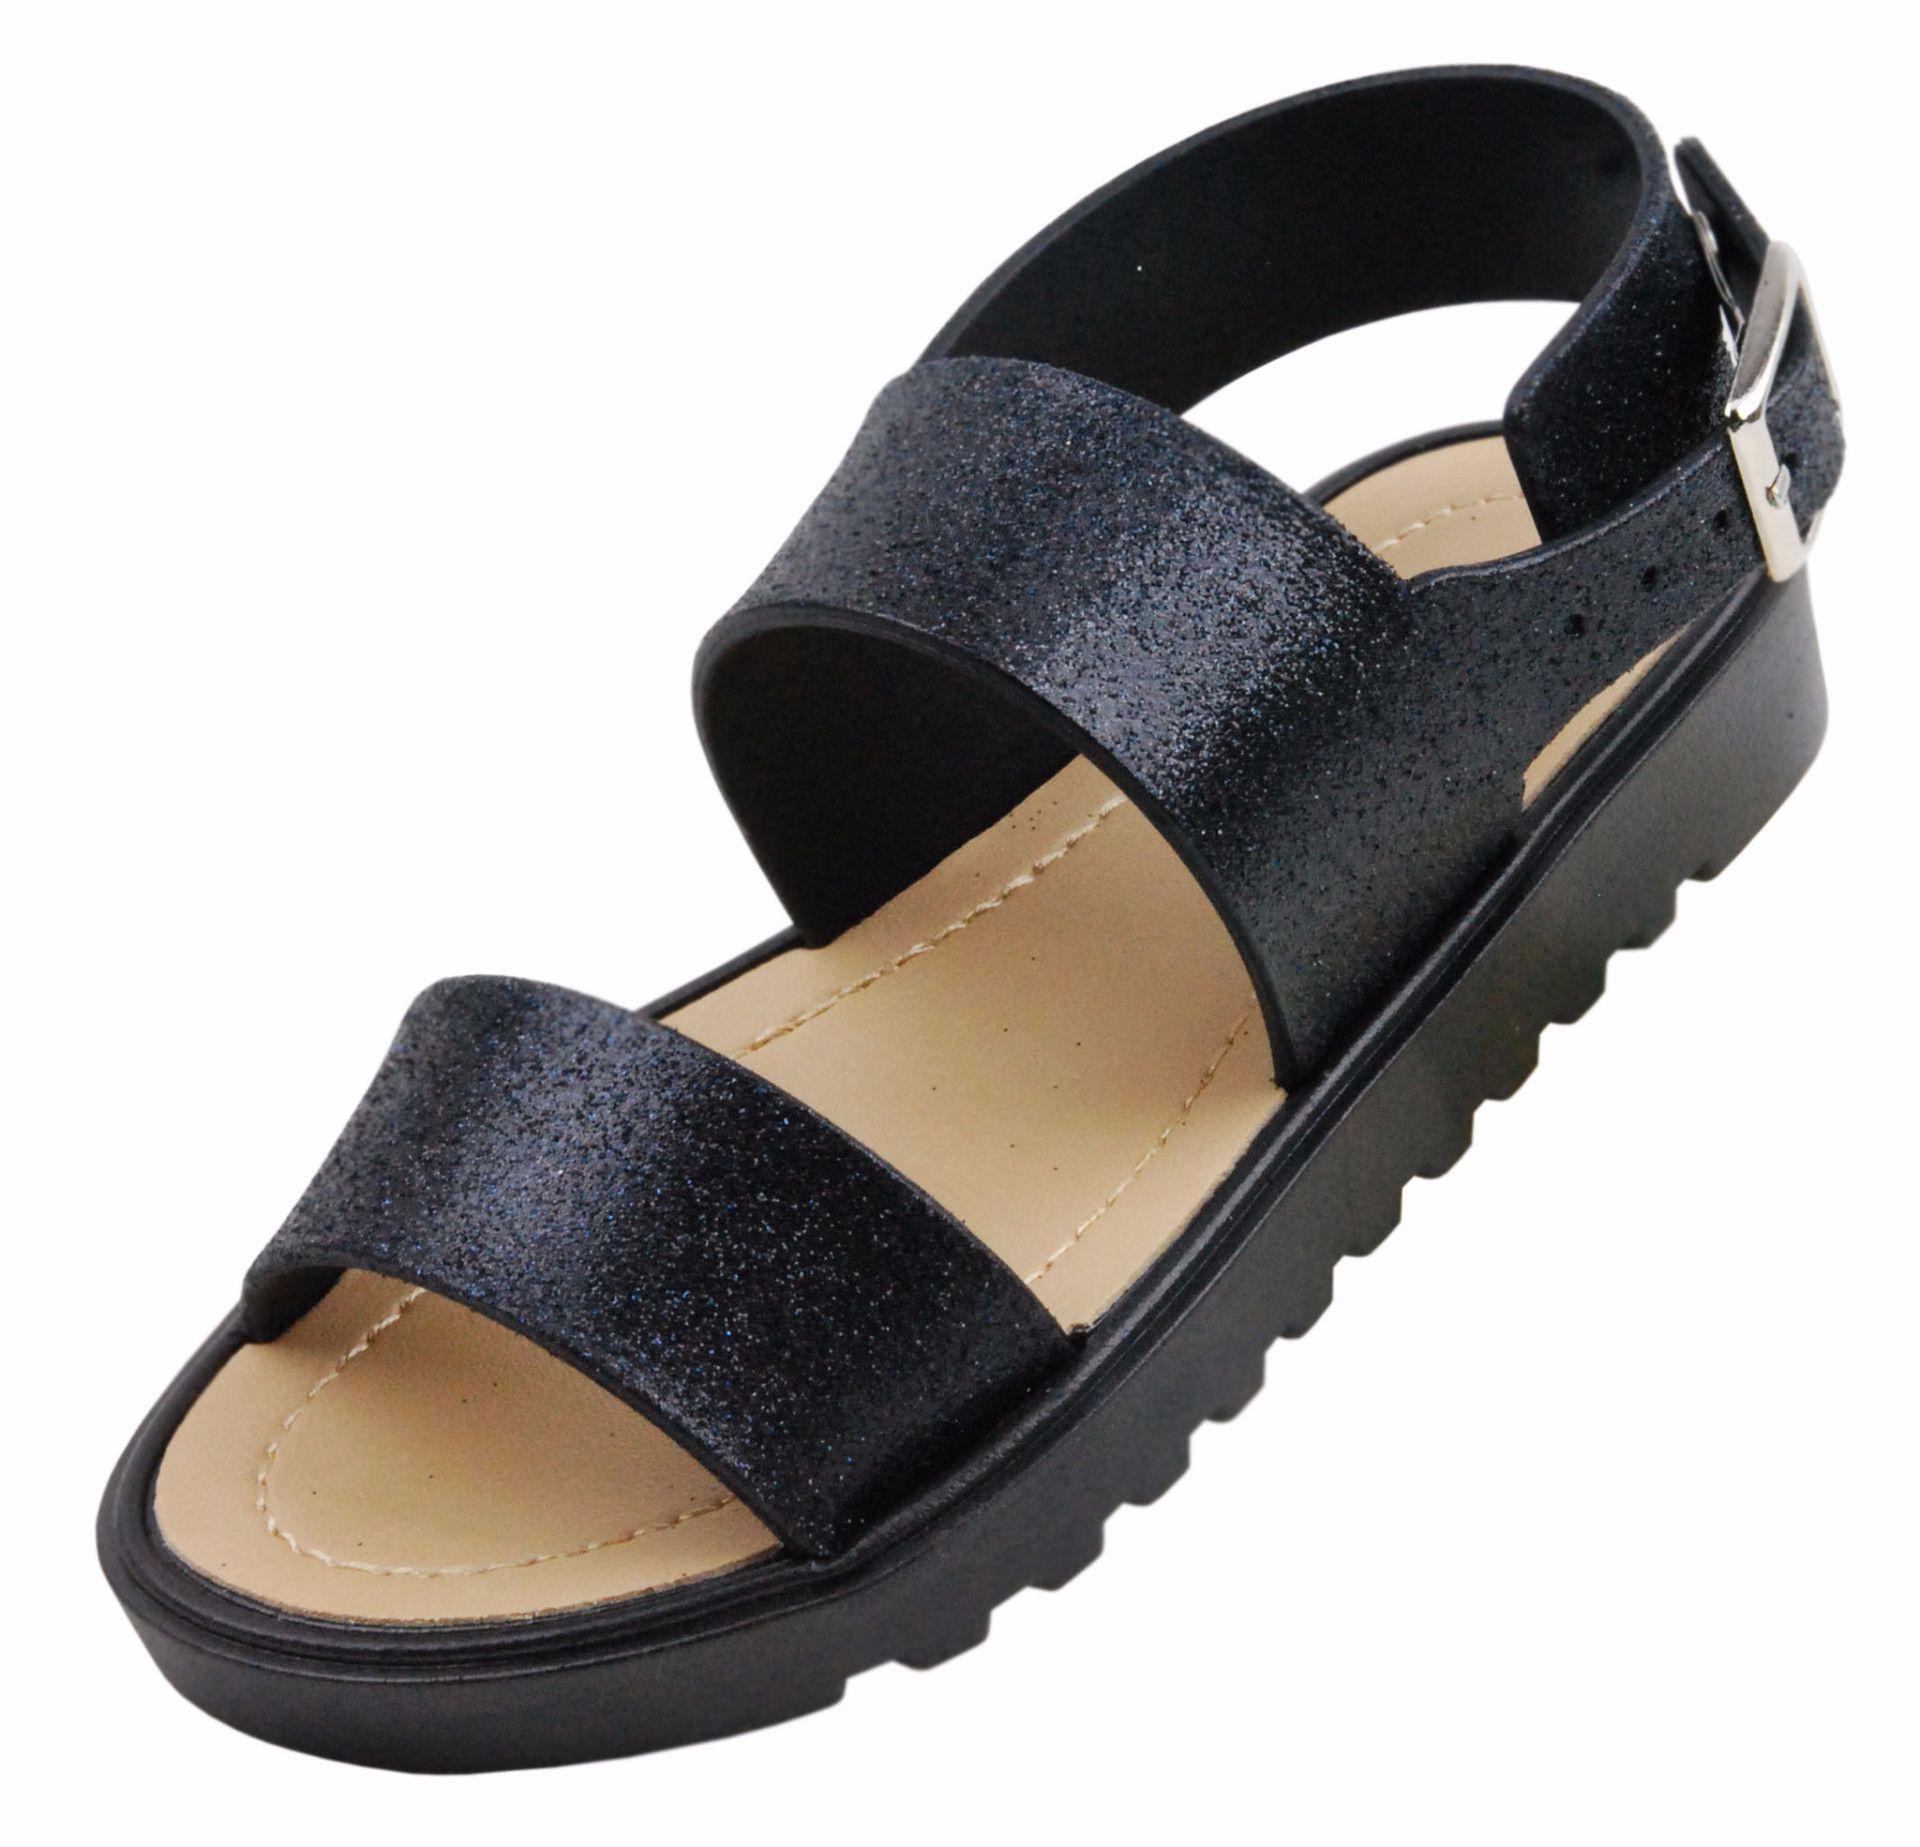 Toddler Little Kids Girls Glitter Color Gladiator Sandals Water Shoes Jelly Shoe (ONLY G-JR)